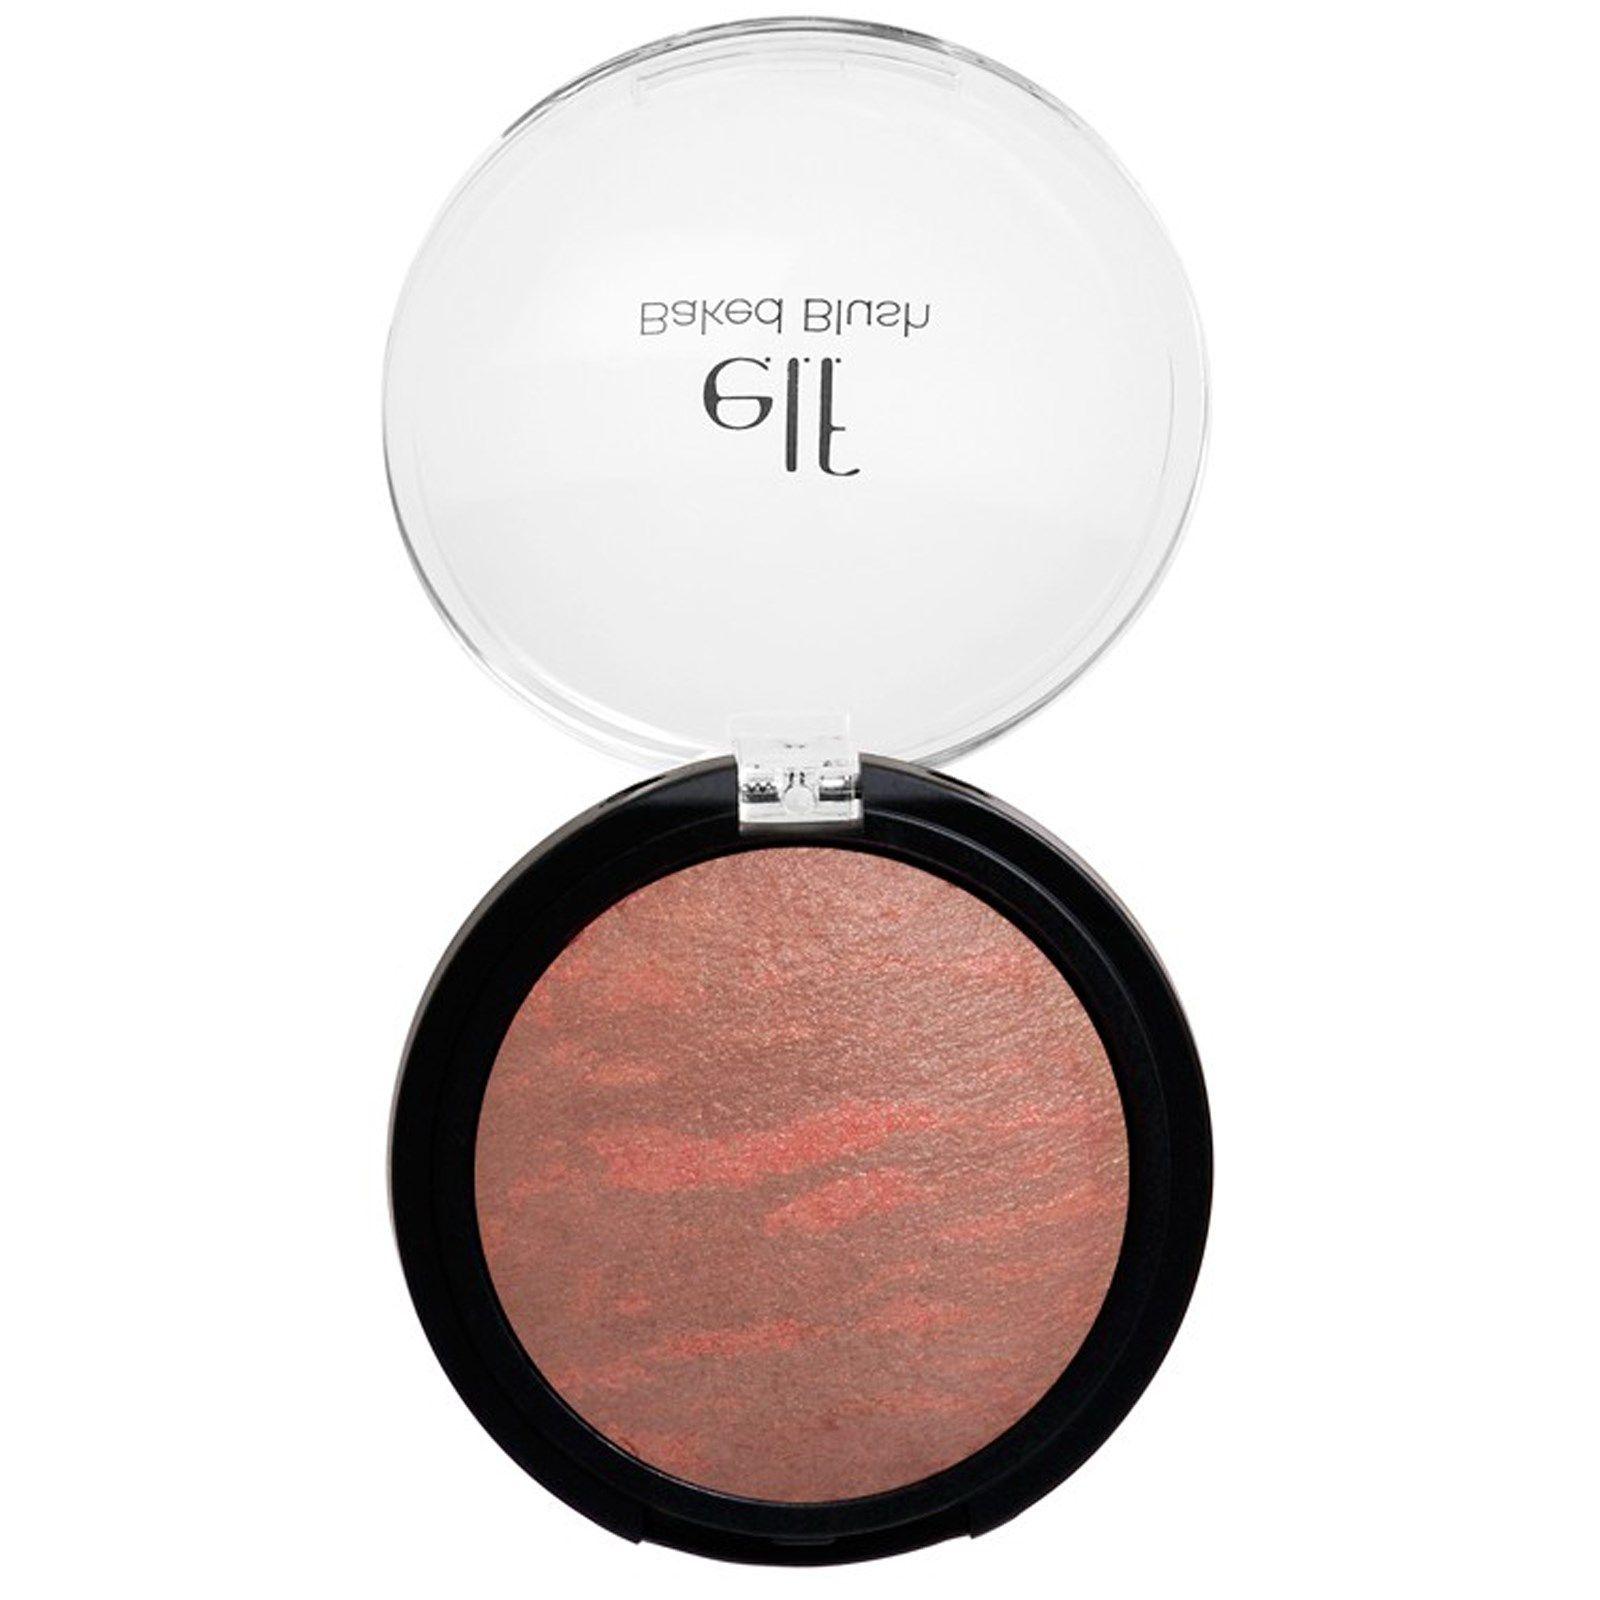 E.L.F. Cosmetics, Baked Blush, Rich Rose, 0.21 oz (6 g) - iHerb.com